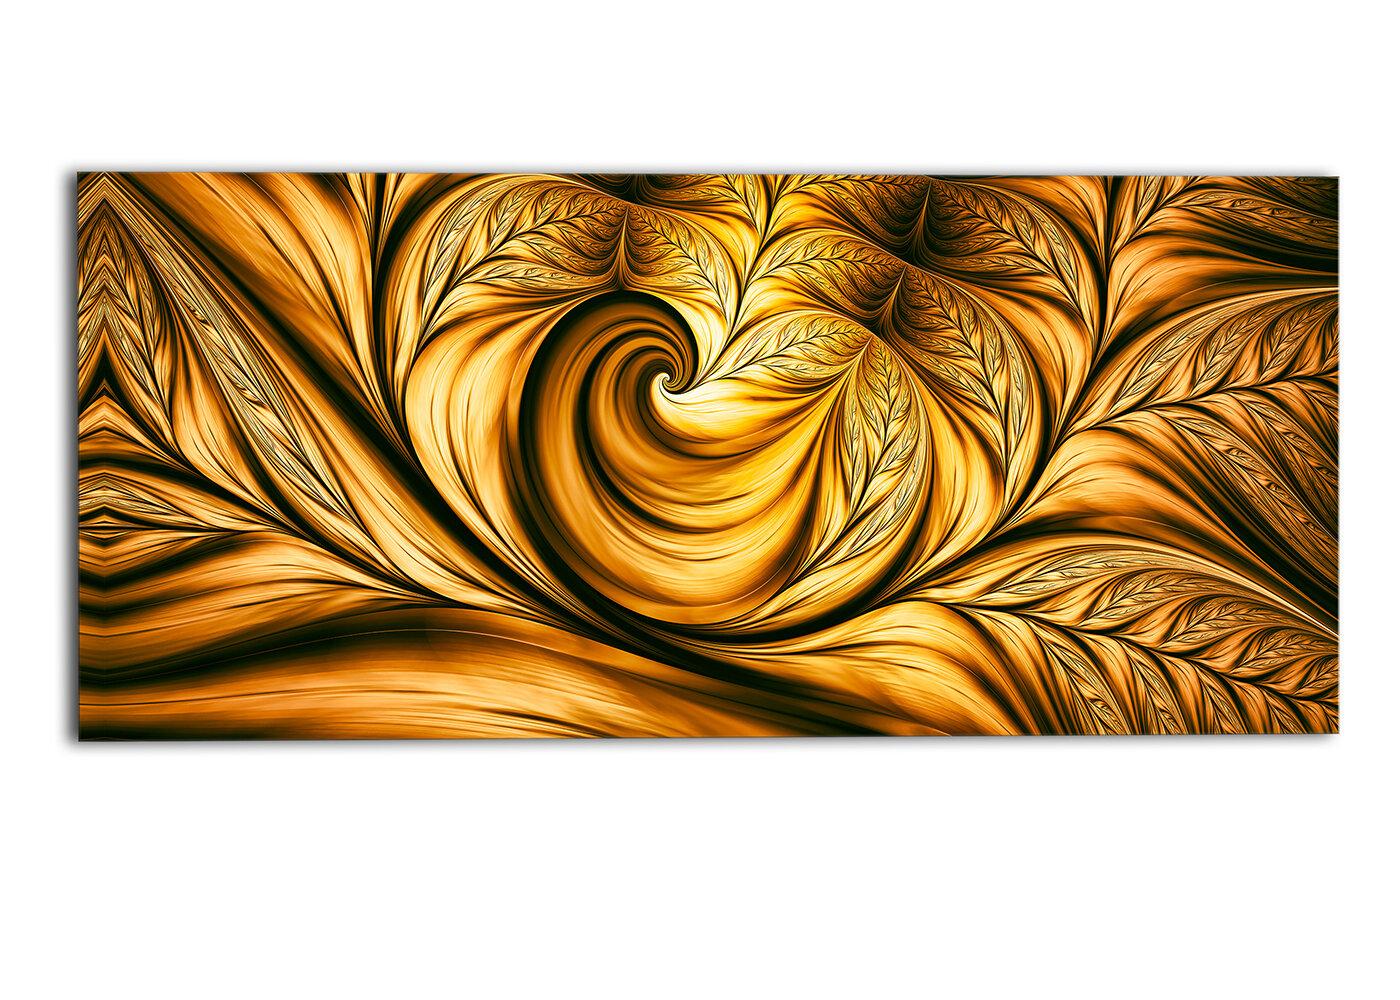 DesignArt Golden Dream Abstract Graphic Art on Wrapped Canvas | Wayfair